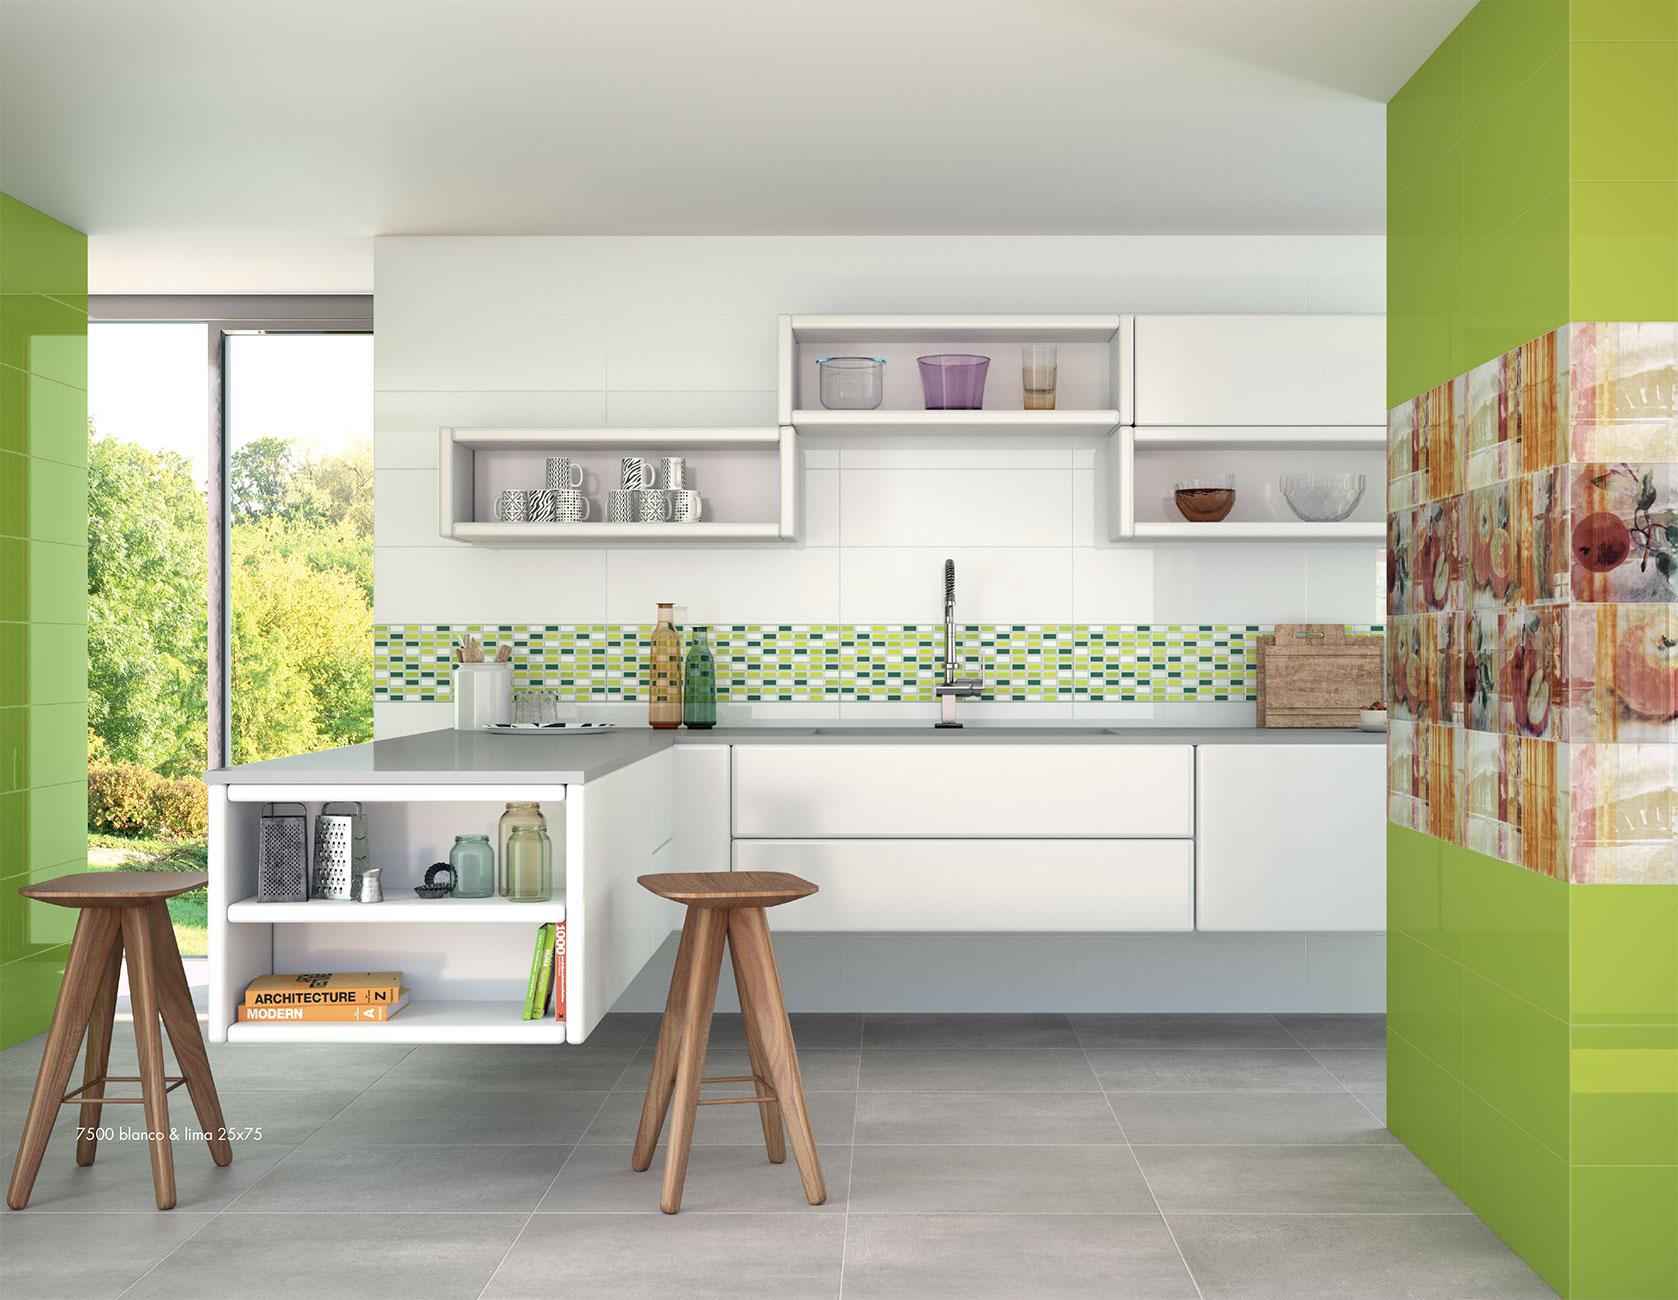 Serie 25x75 7500 azulejos y pavimentos mart n for Azulejos y pavimentos san juan